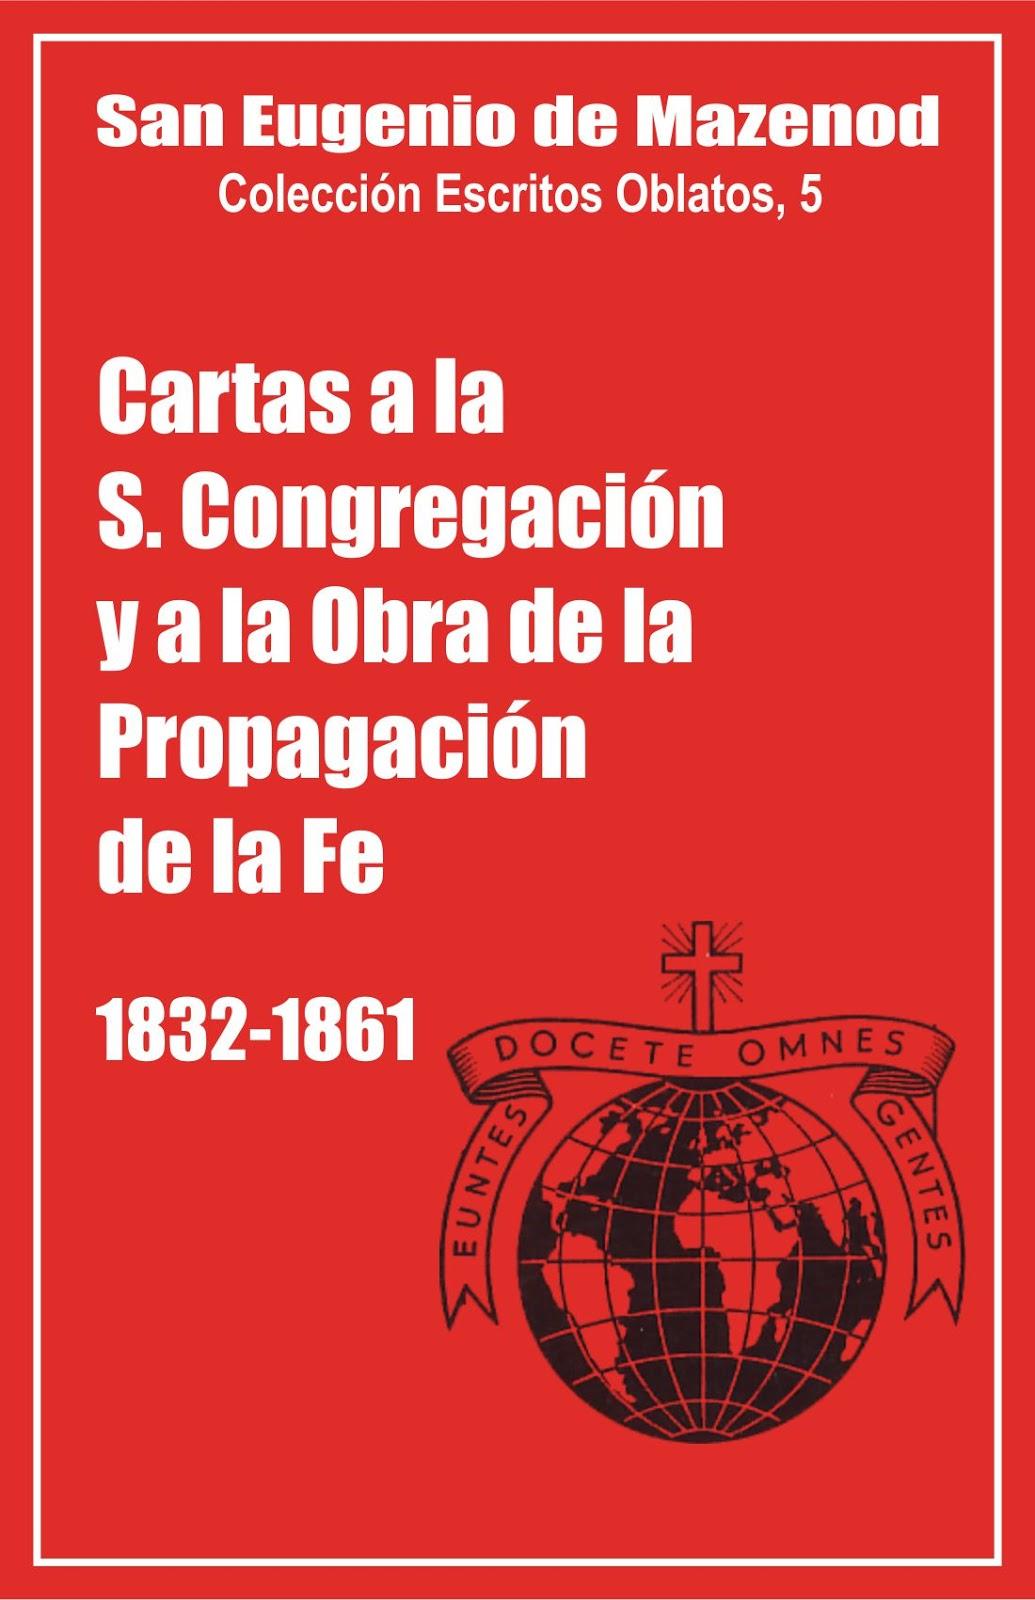 Parroquia Jesús Nazareno: 5. Cartas a Propaganda Fide